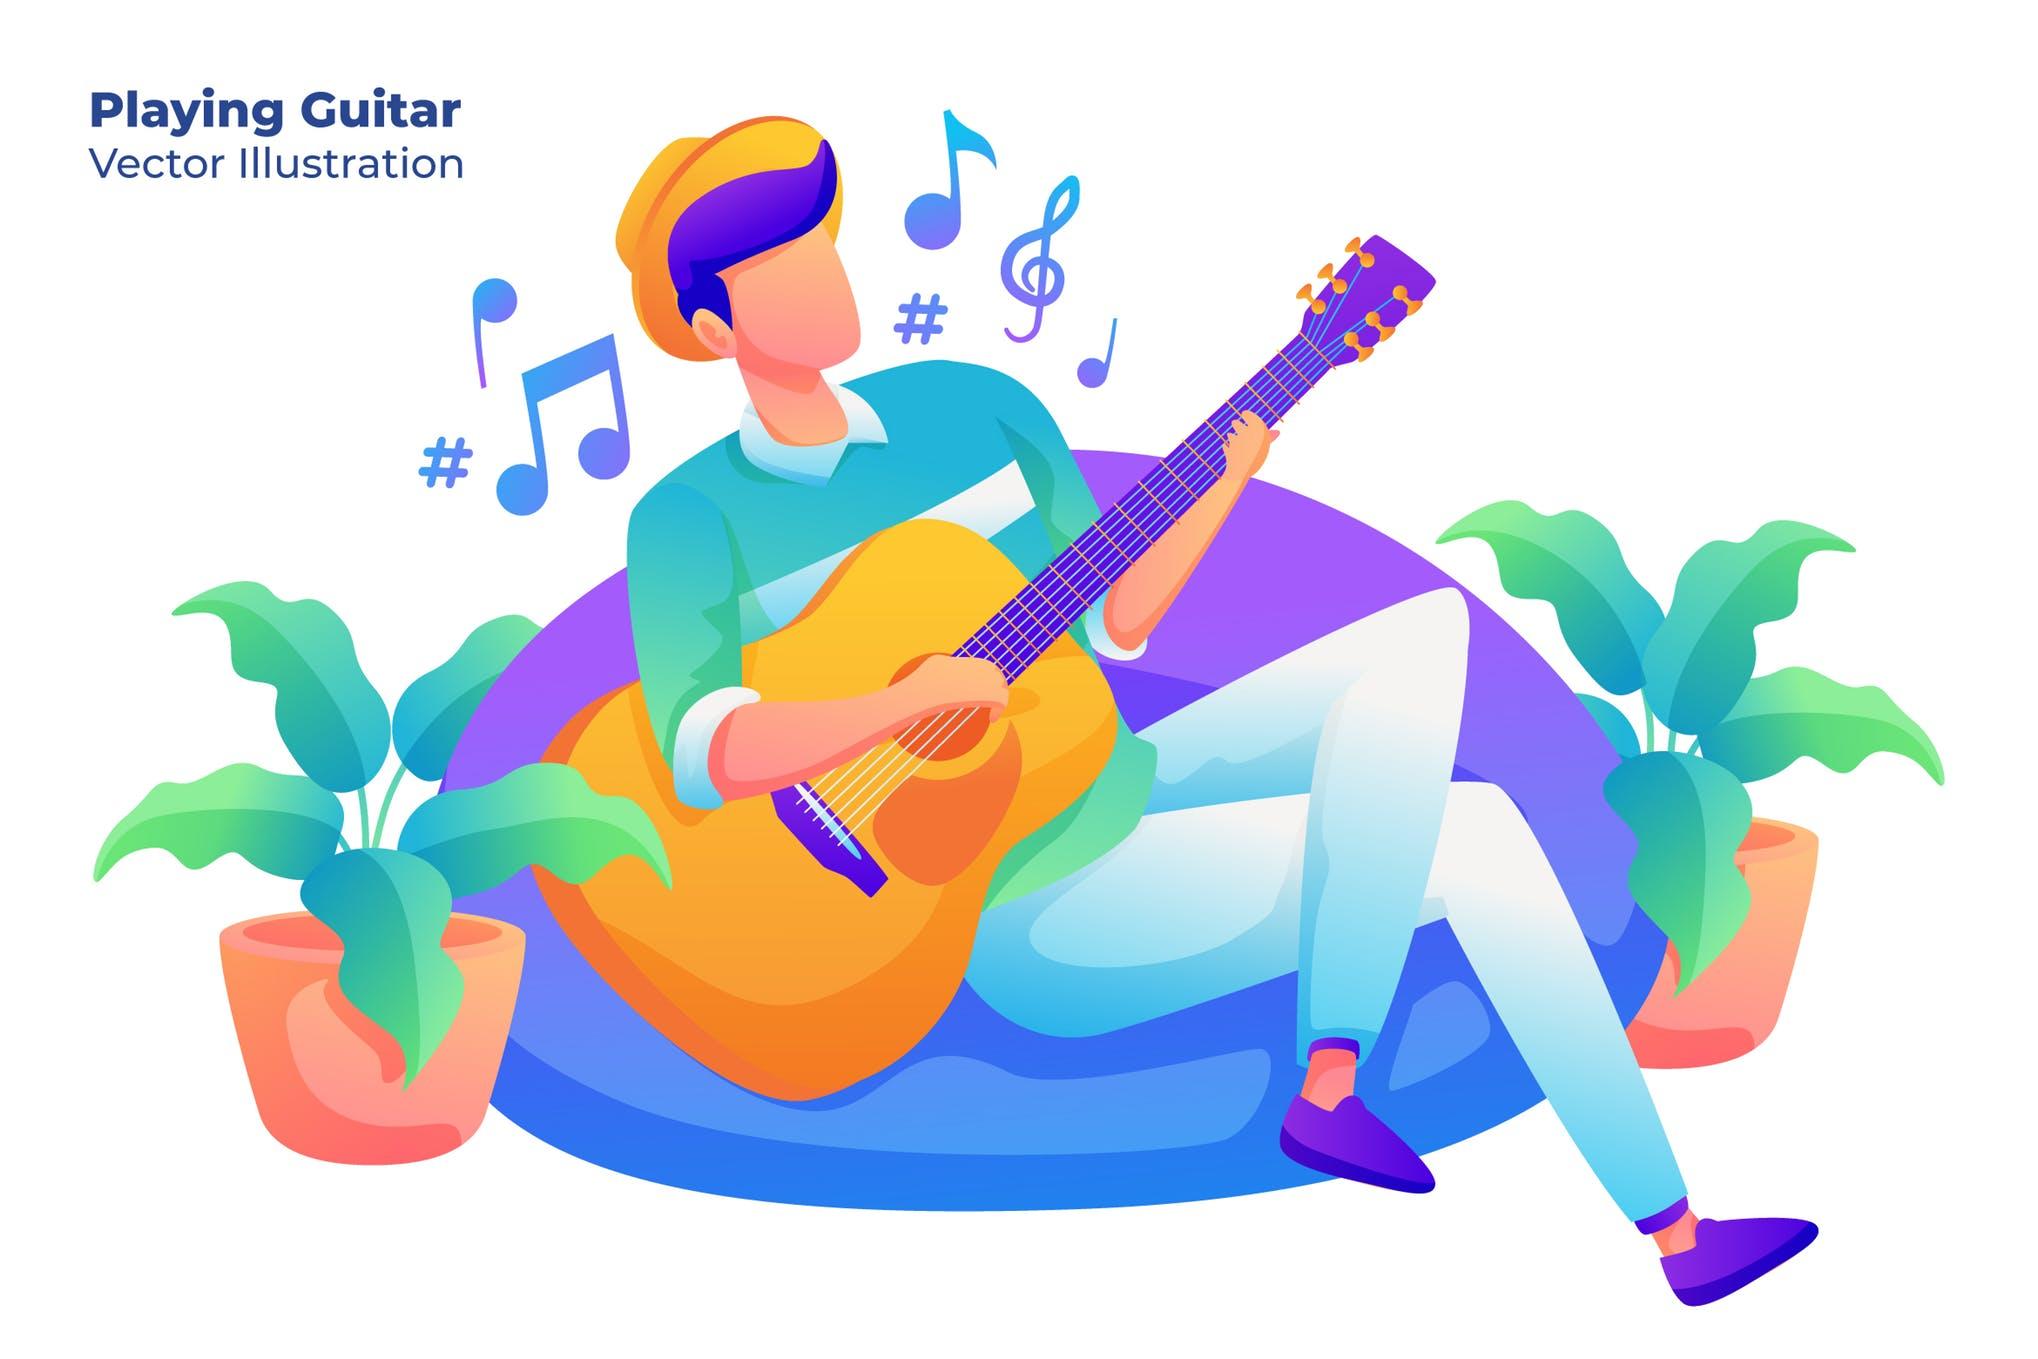 音乐排队插画设计素材下载Playing Guitar - Vector Illustration